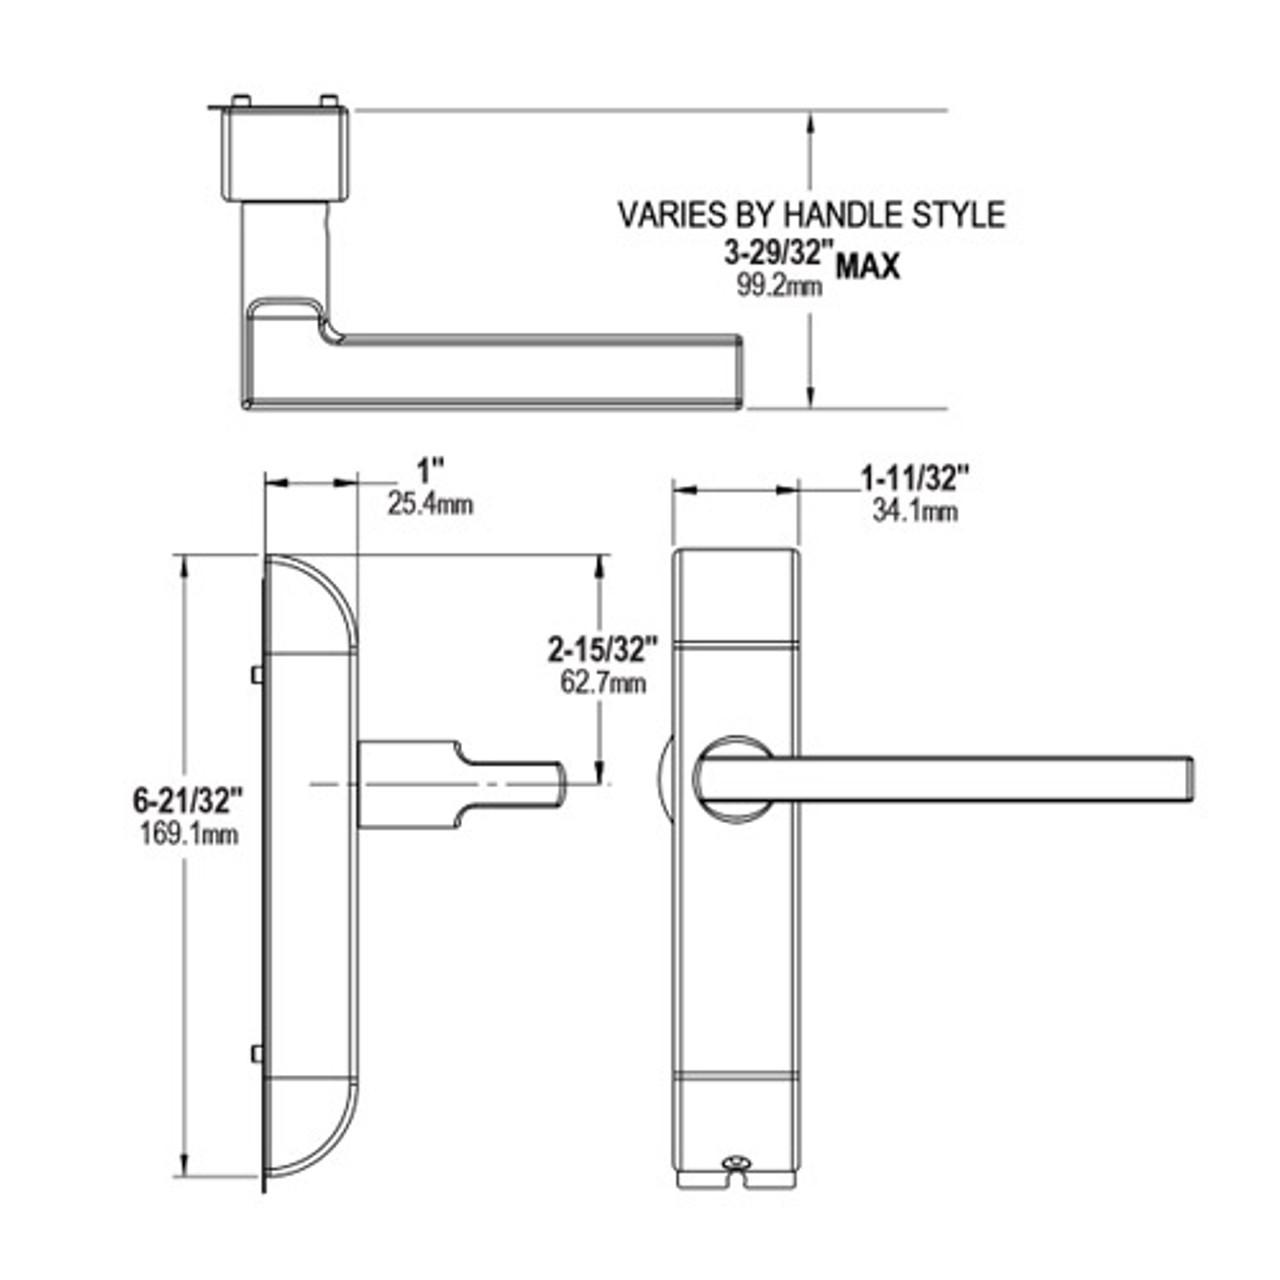 4600-MV-531-US32D Adams Rite MV Designer handle Dimensional View